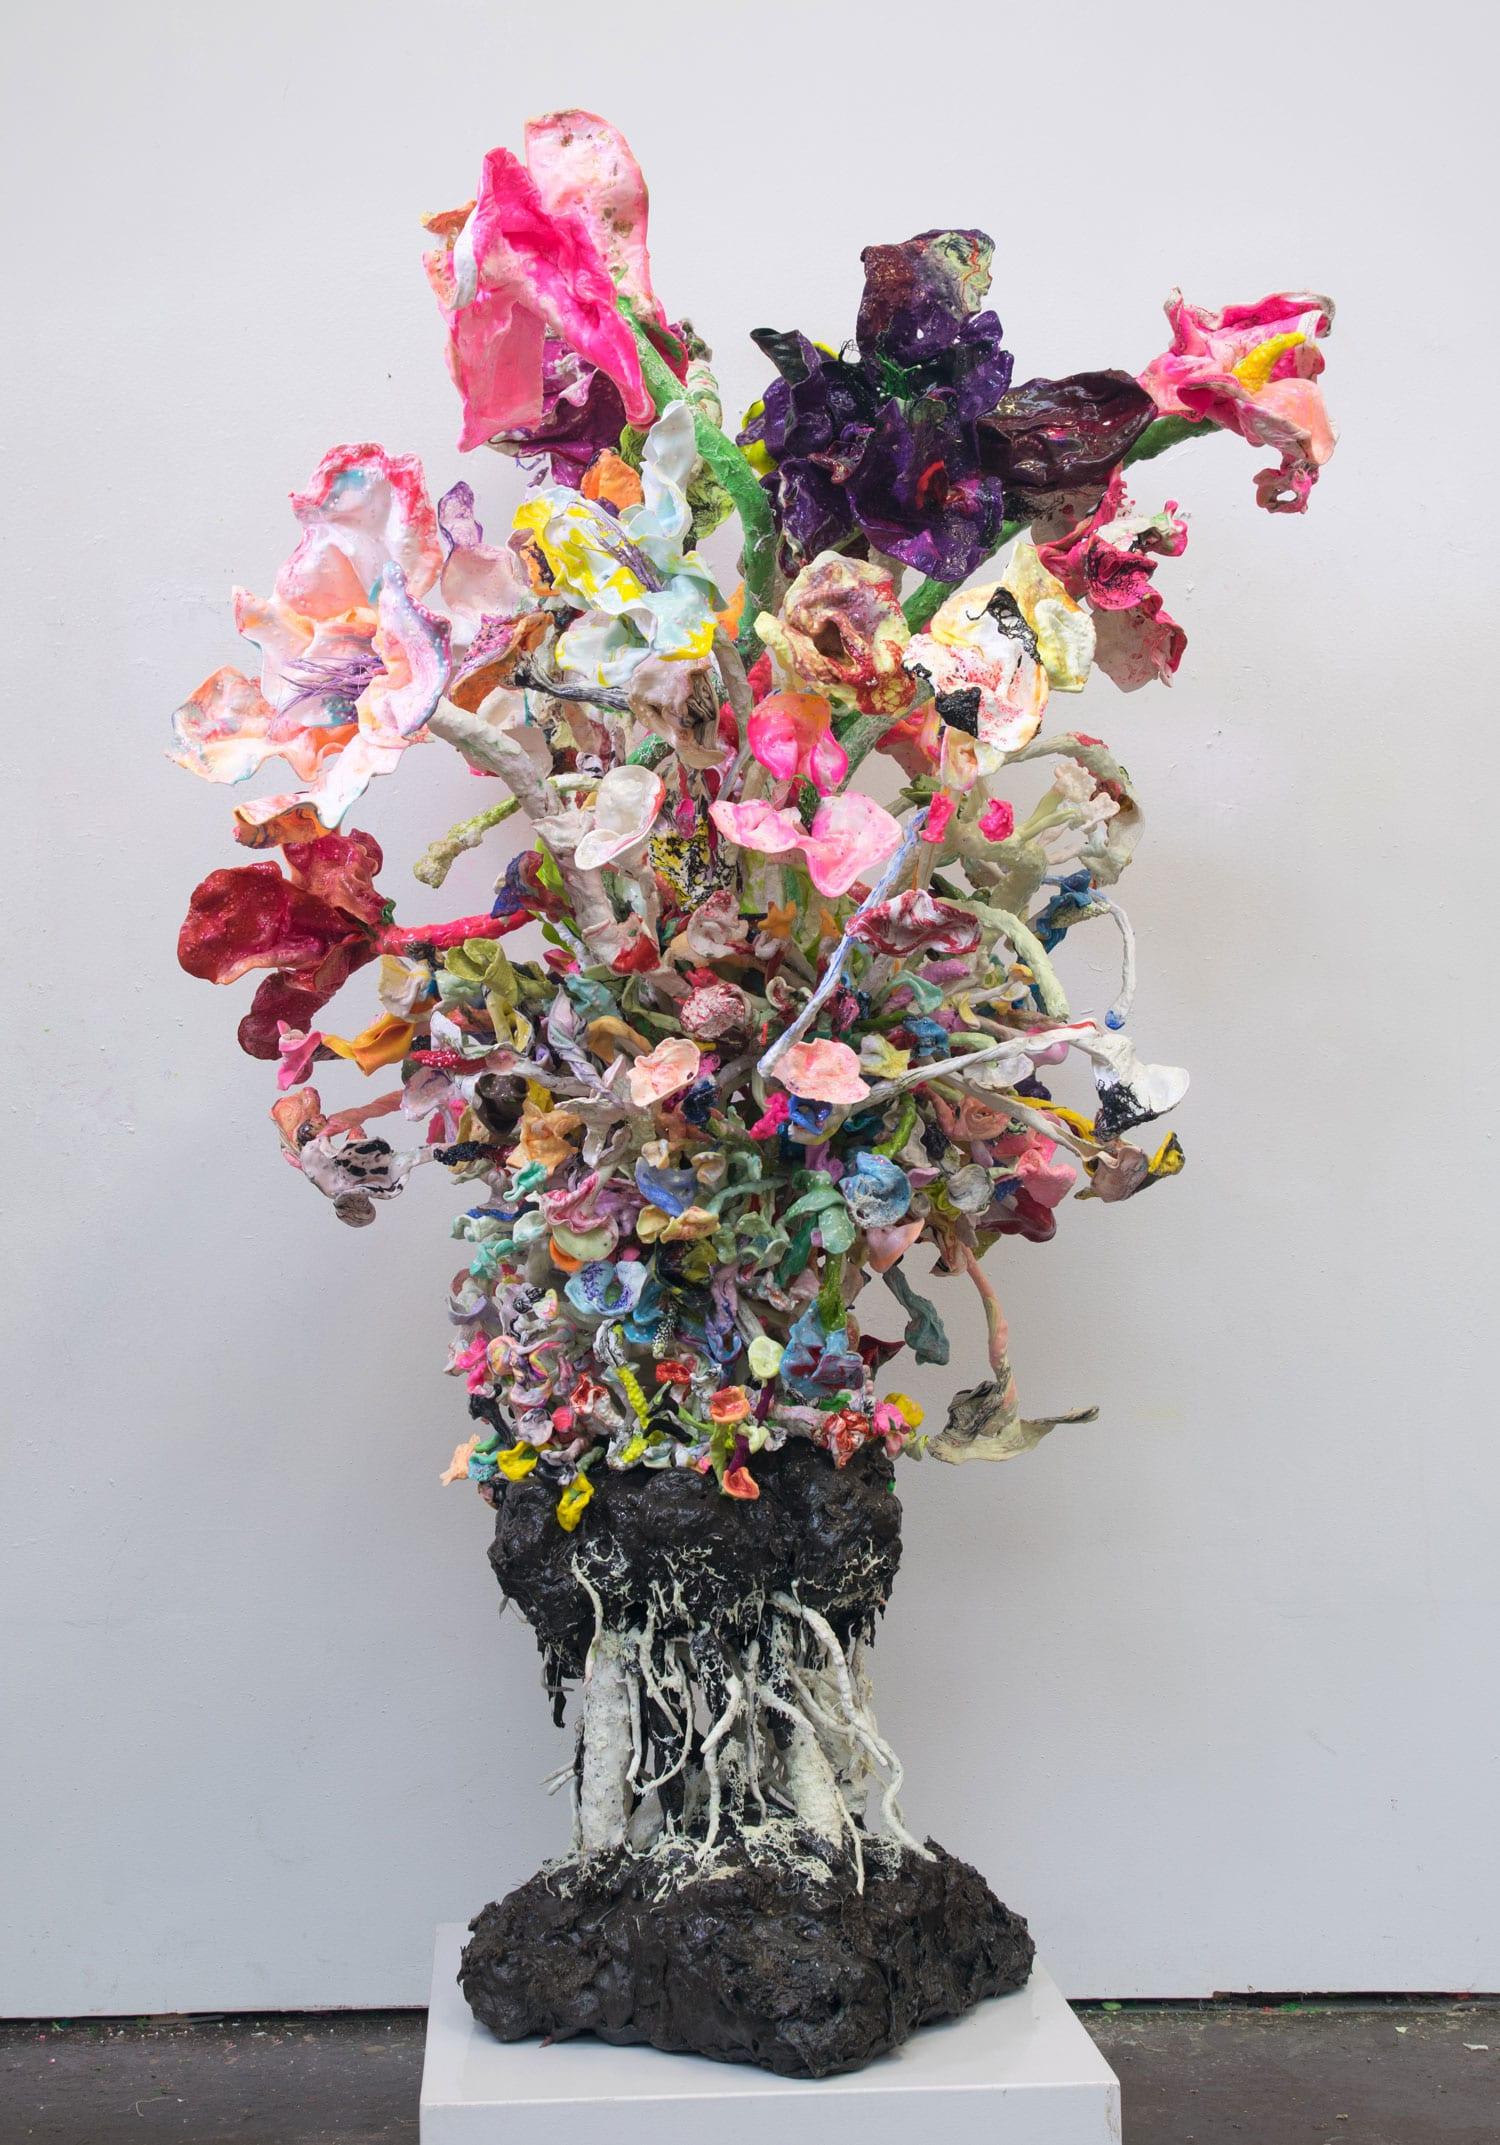 Oil Plastic Sculptures by Stefan Gross | Yellowtrace